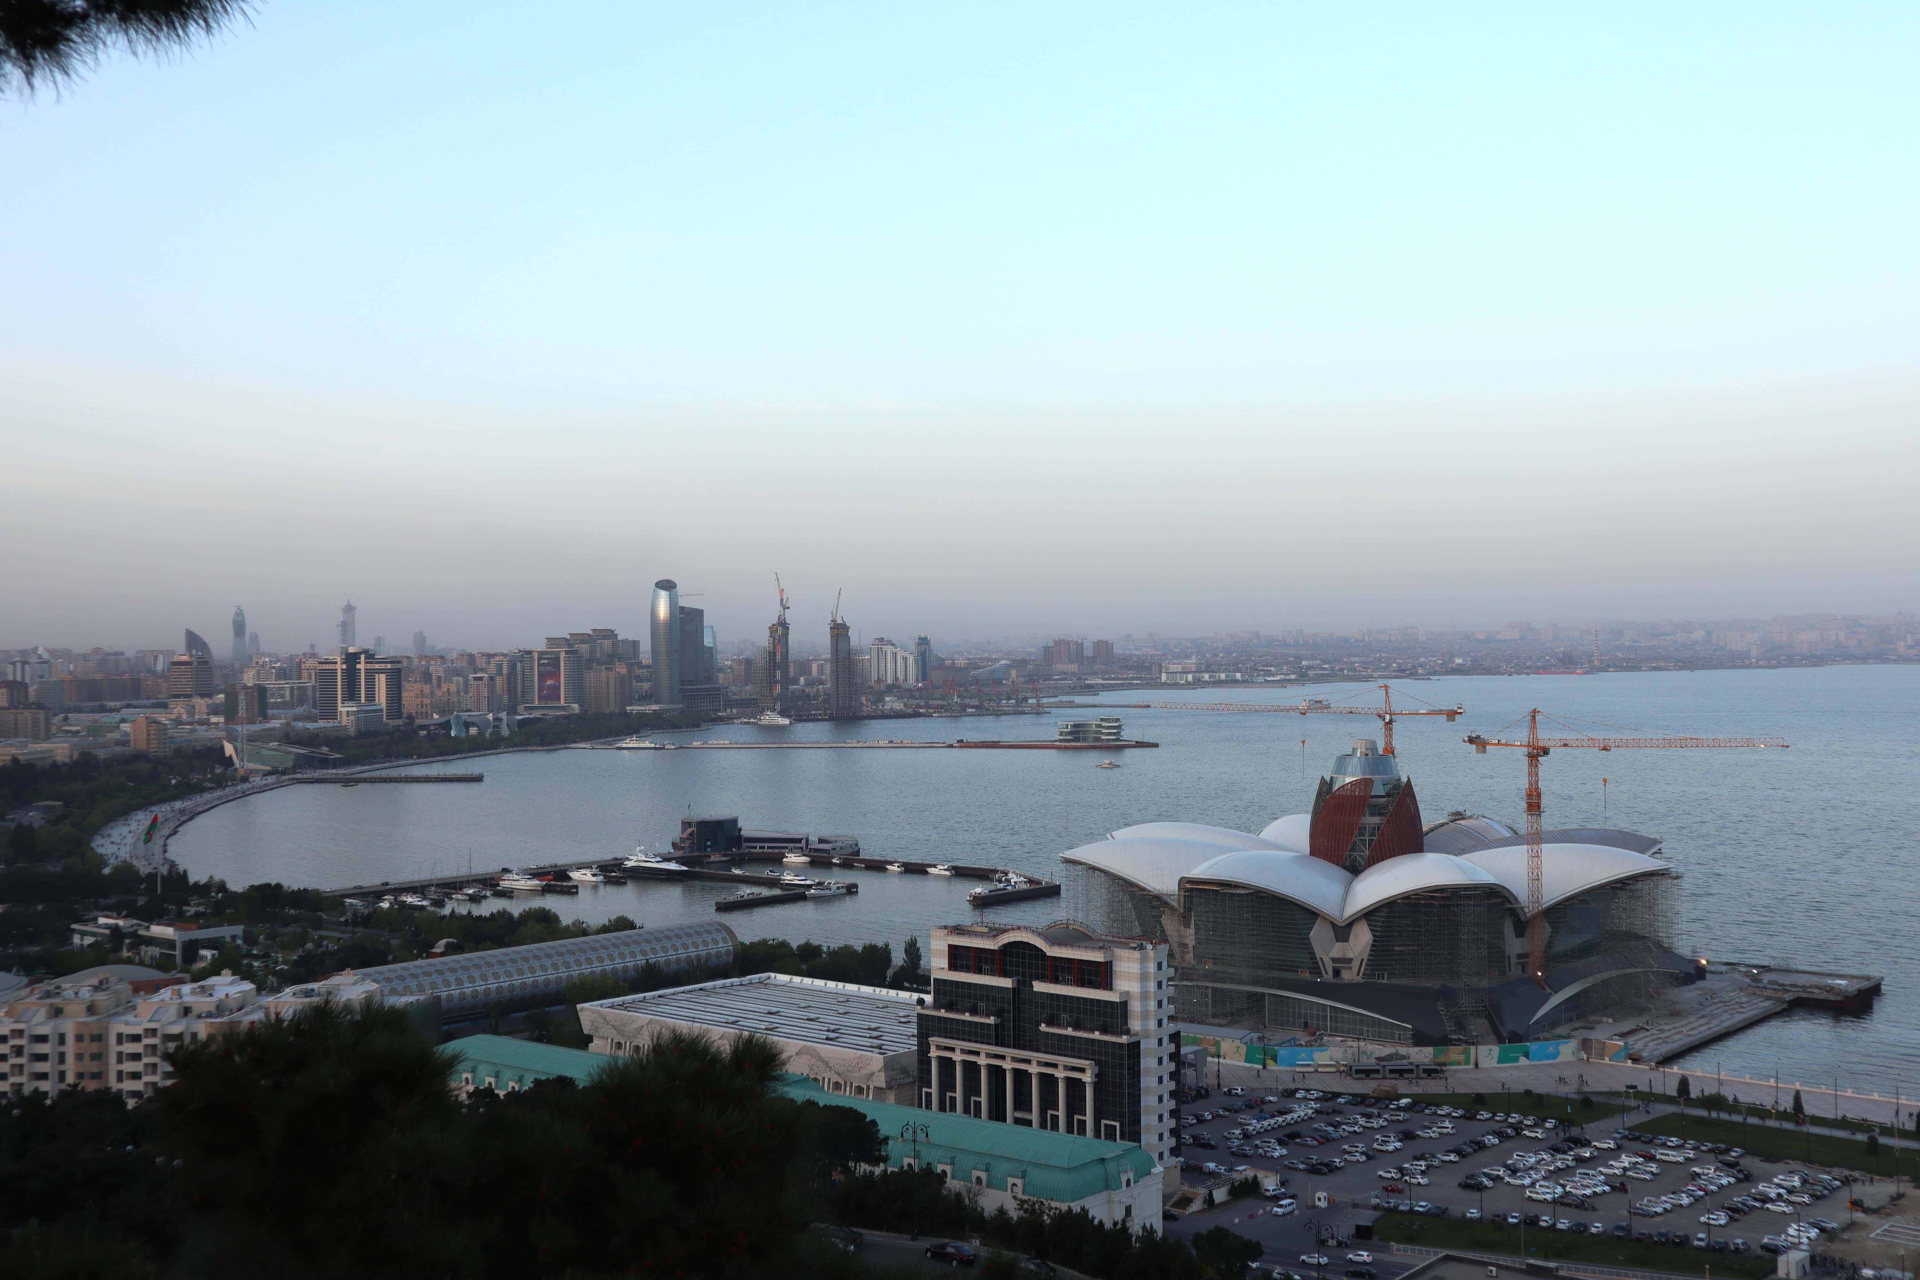 A hilltop view of the Caspian Sea and Baku's shoreline.